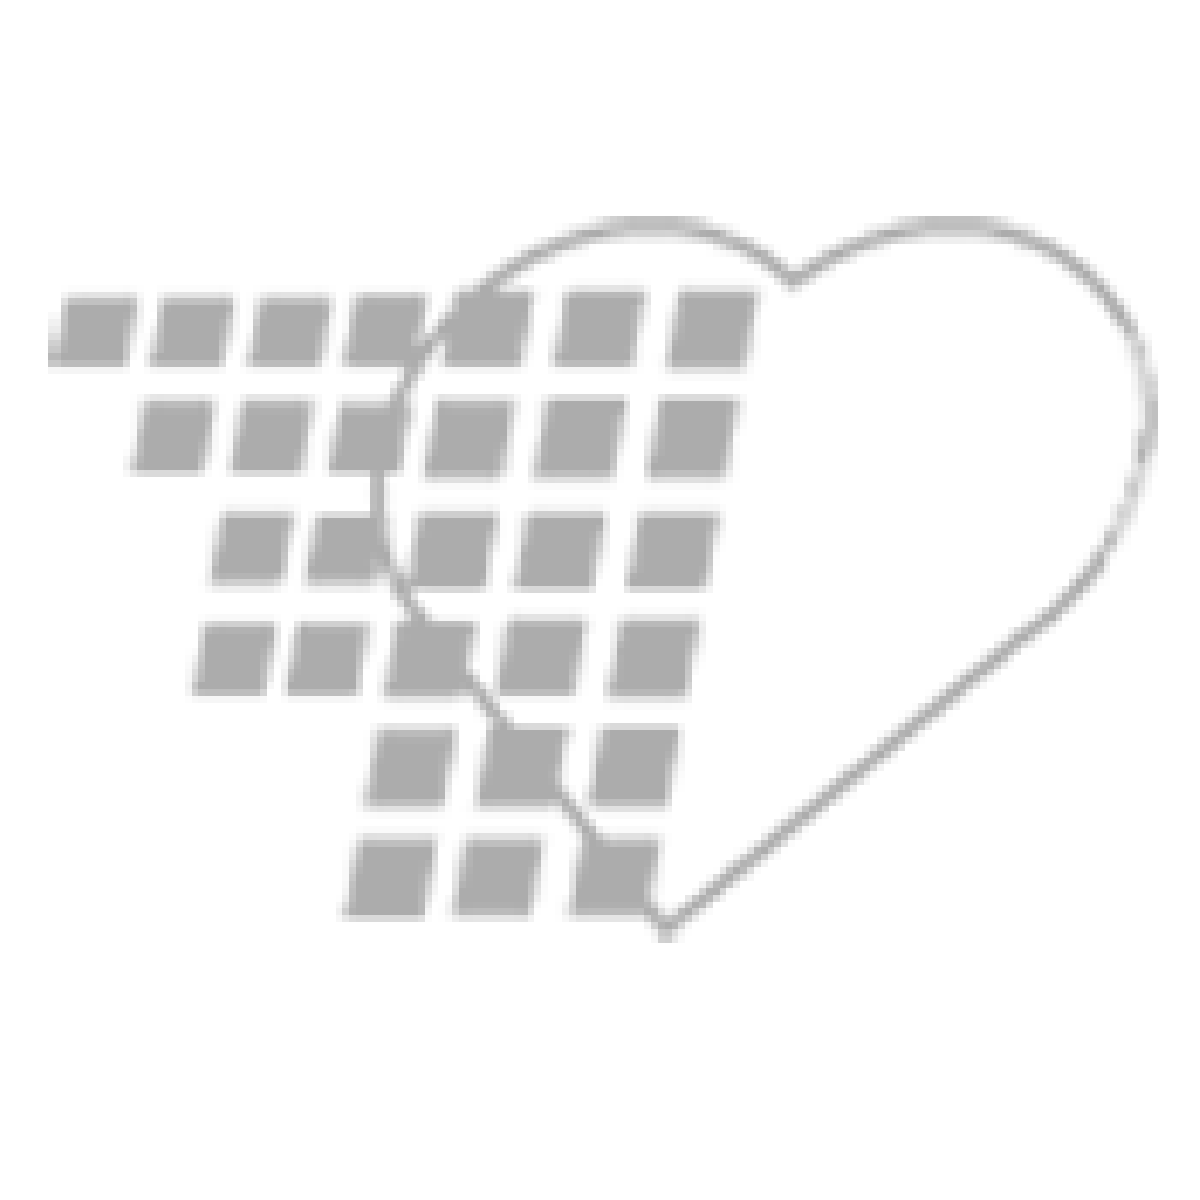 06-93-1123 - Demo Dose® Sodim Bicrb 8.4% Pediatric 10mL